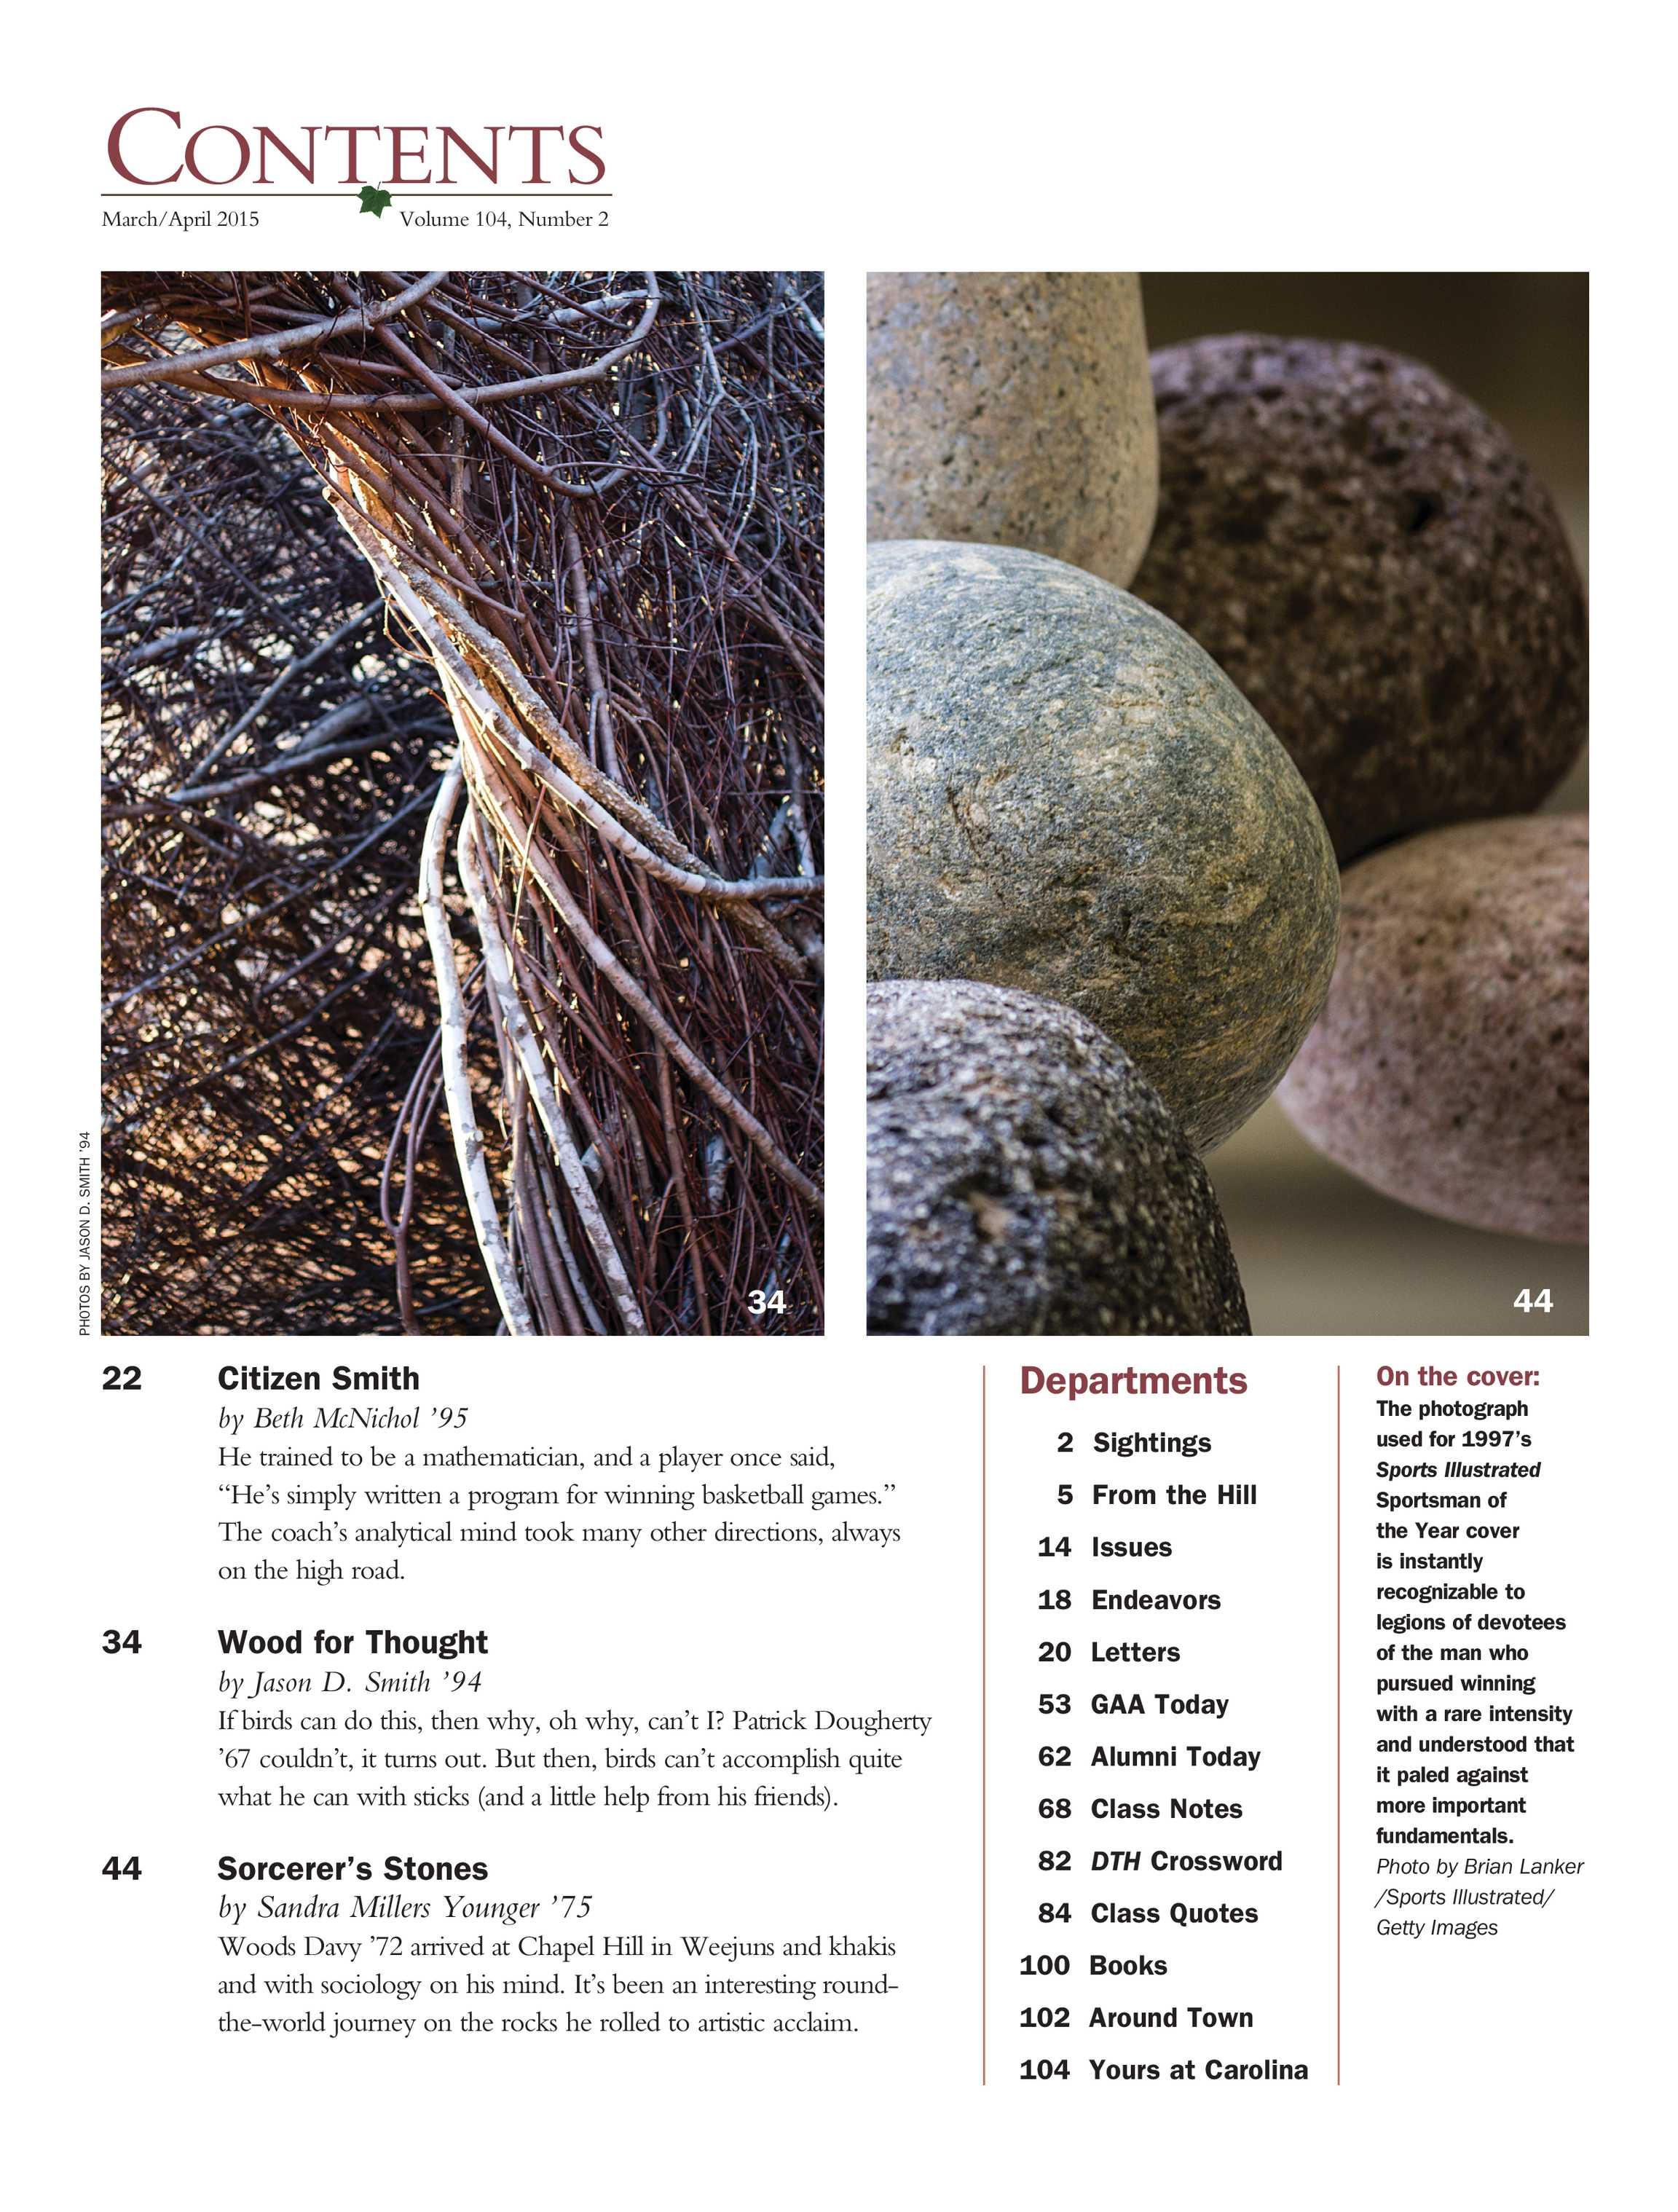 Carolina Alumni Review - March/April 2015 - page 1